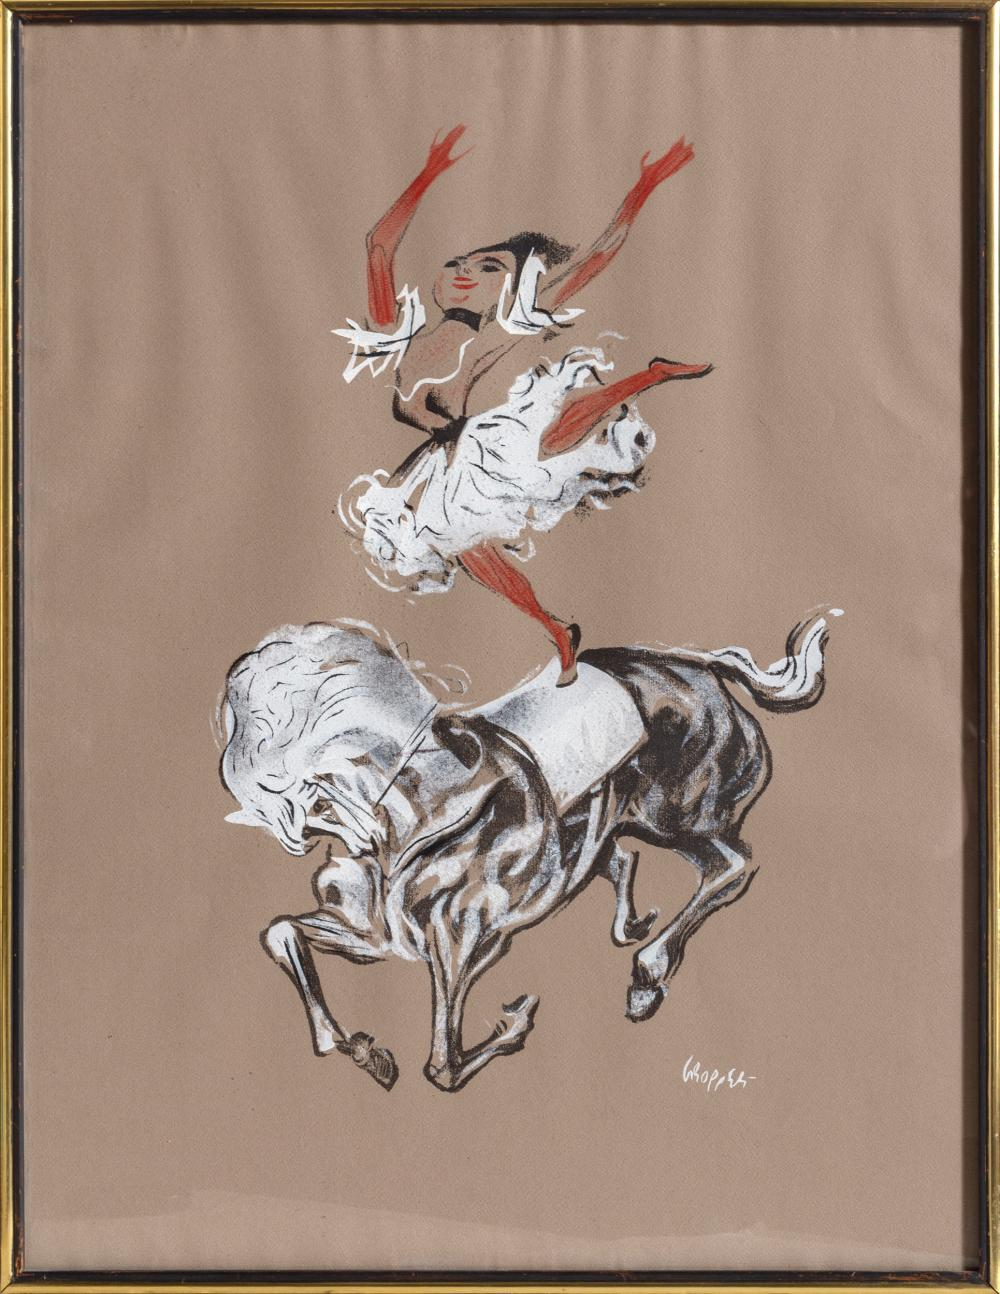 William Gropper, Dancer on Horseback, Lithograph